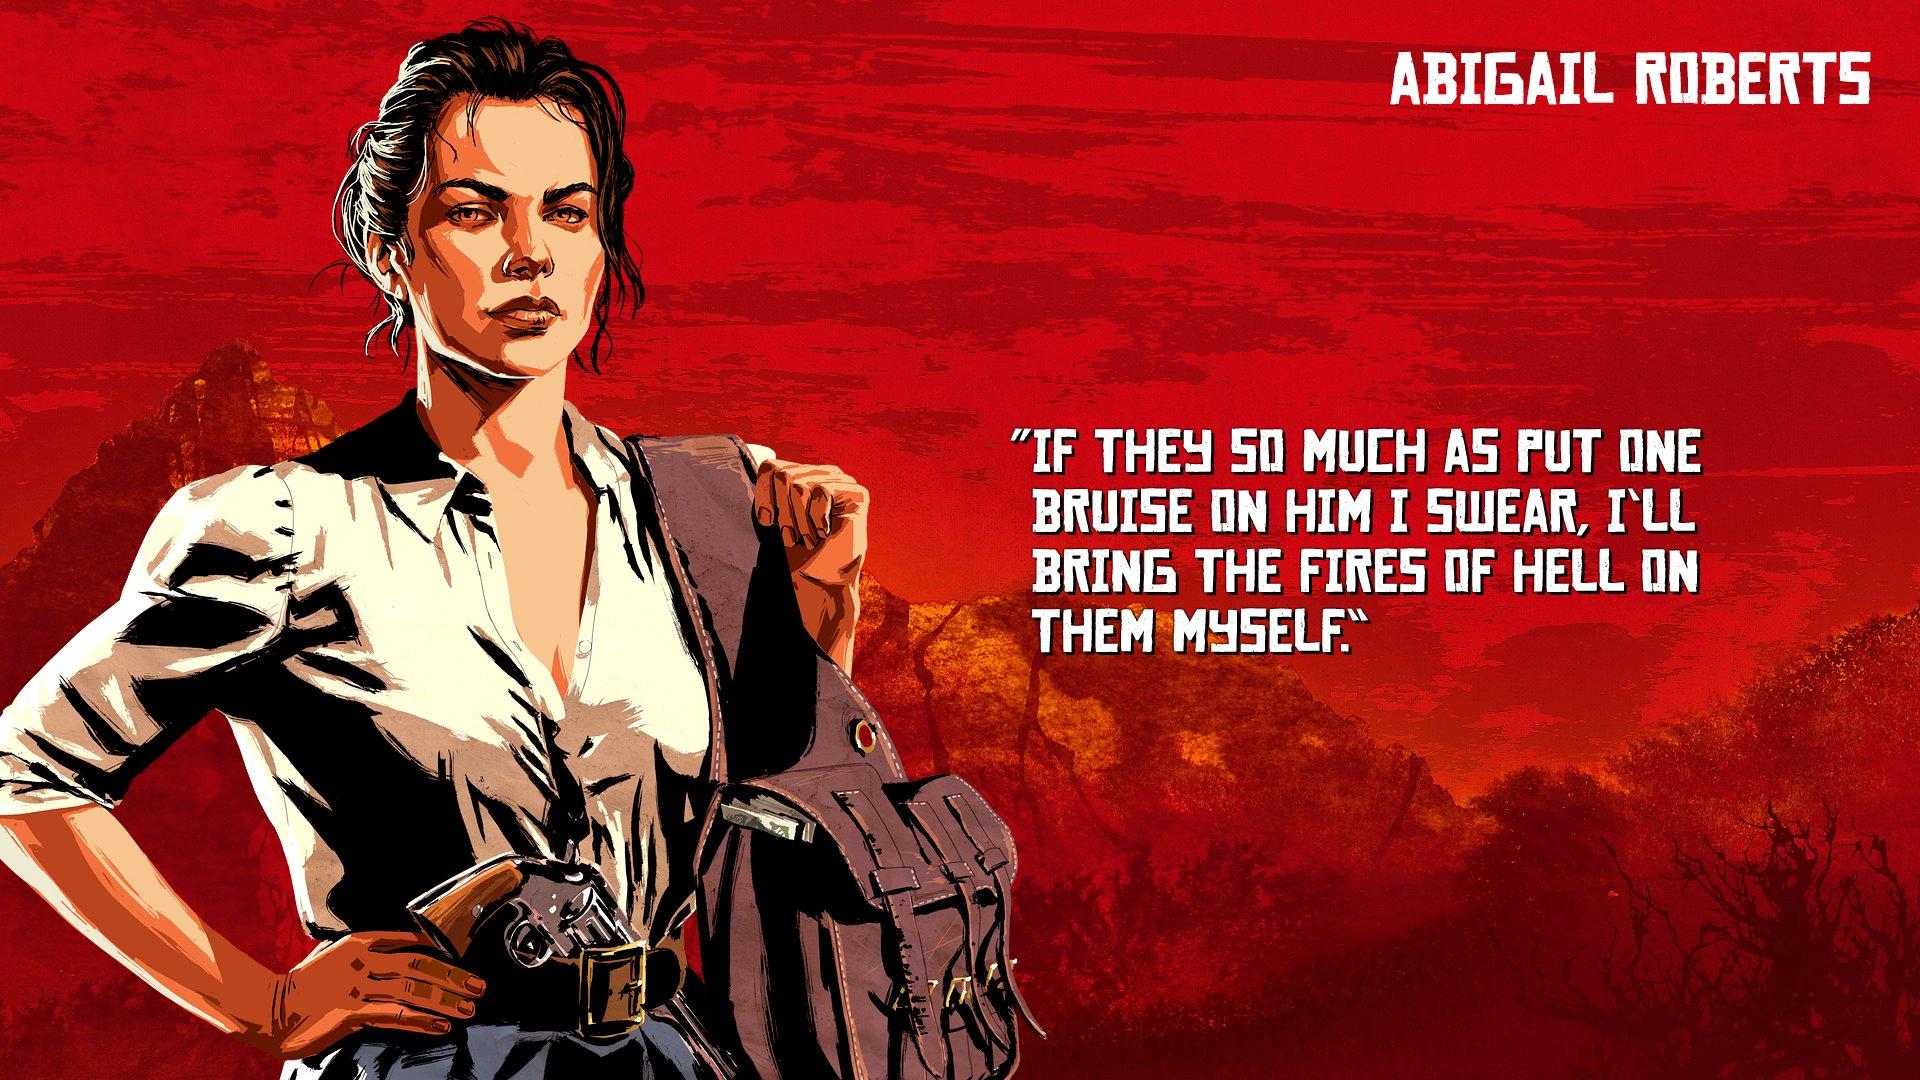 Rockstar Games revela artes dos personagens de Red Dead Redemption 2; veja 3